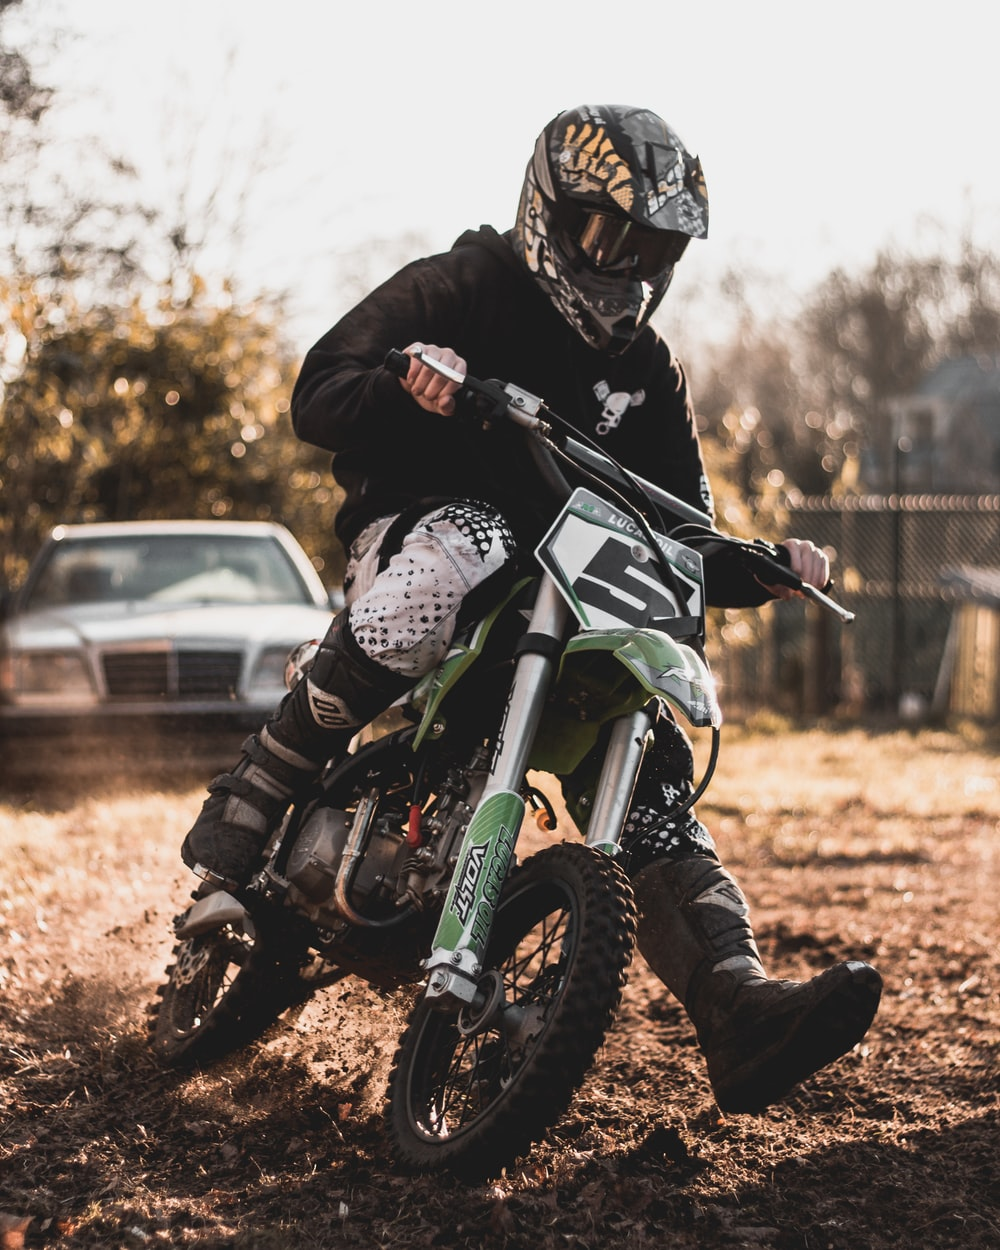 man riding on black and green motocross dirt bike